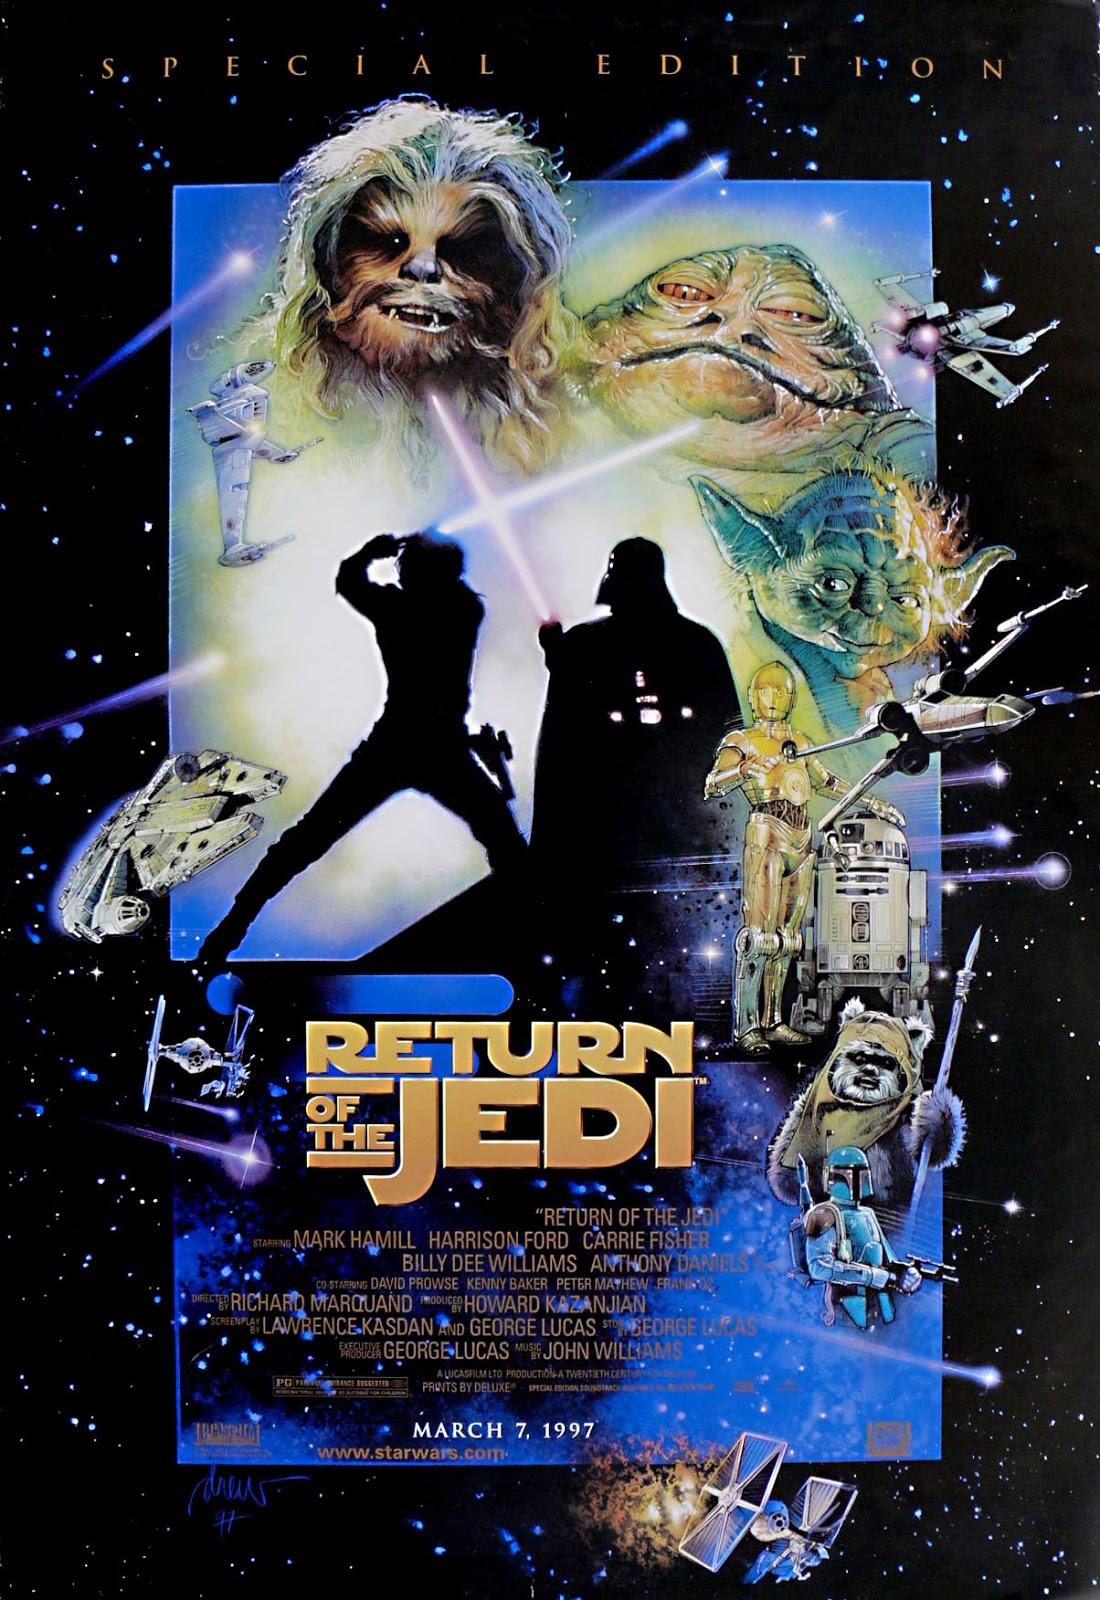 [Image: Star-Wars-Return-Of-The-Jedi-1983-Specia...truzan.jpg]